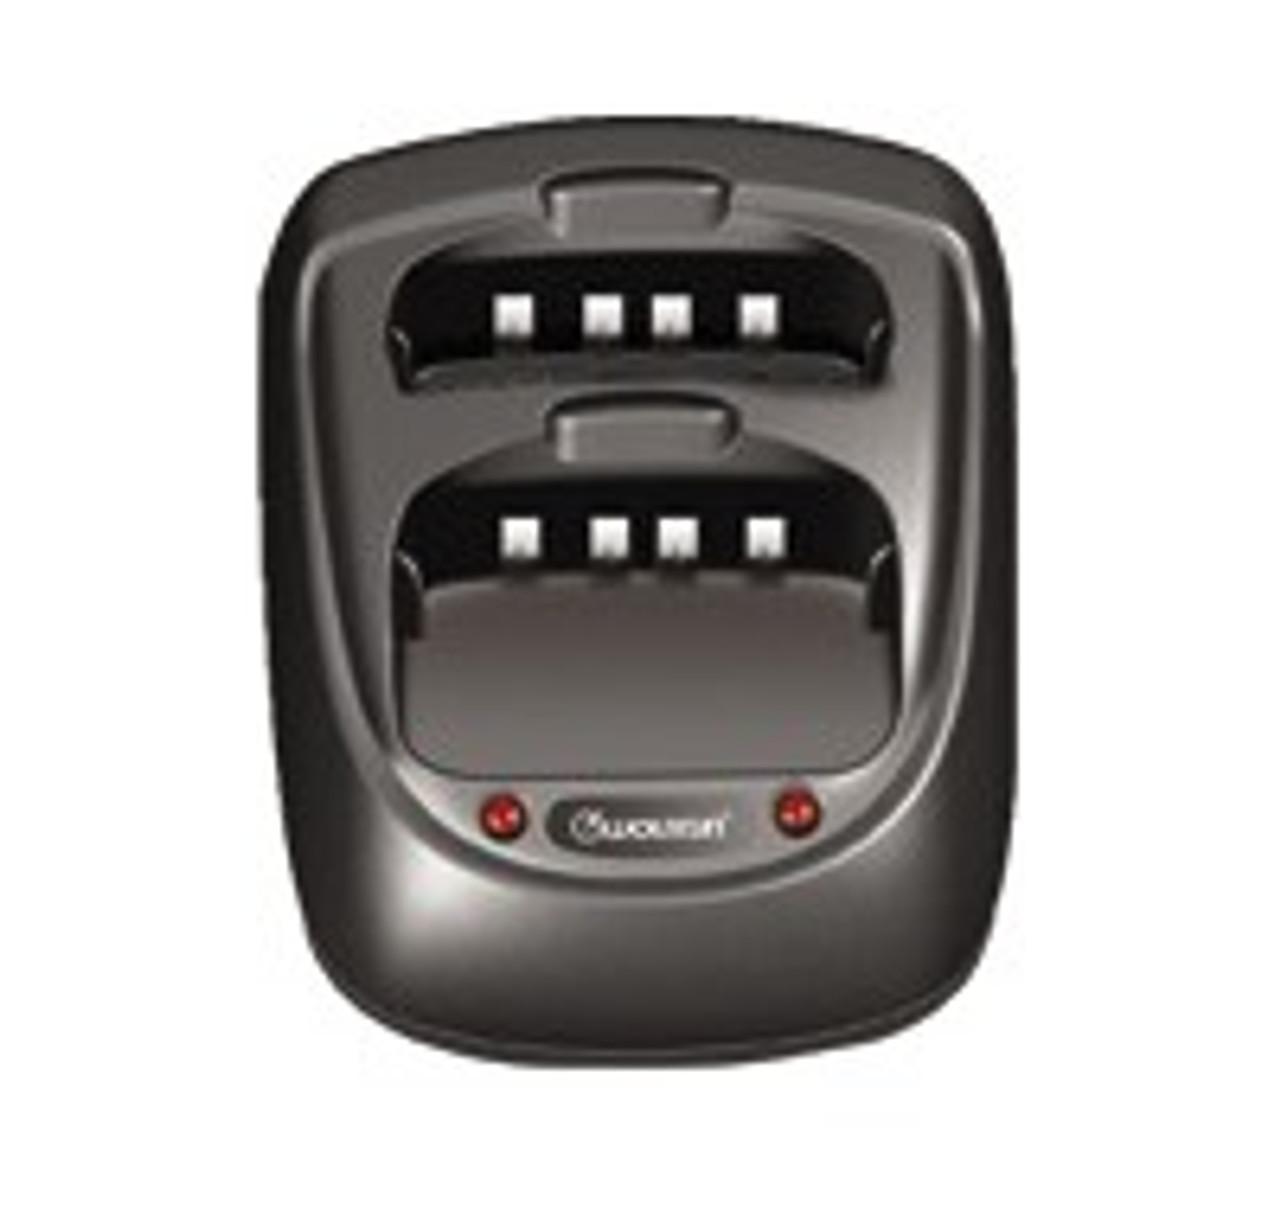 Wouxun Dual Slot Drop Charger - KG-UVD1P and KG-UV6D